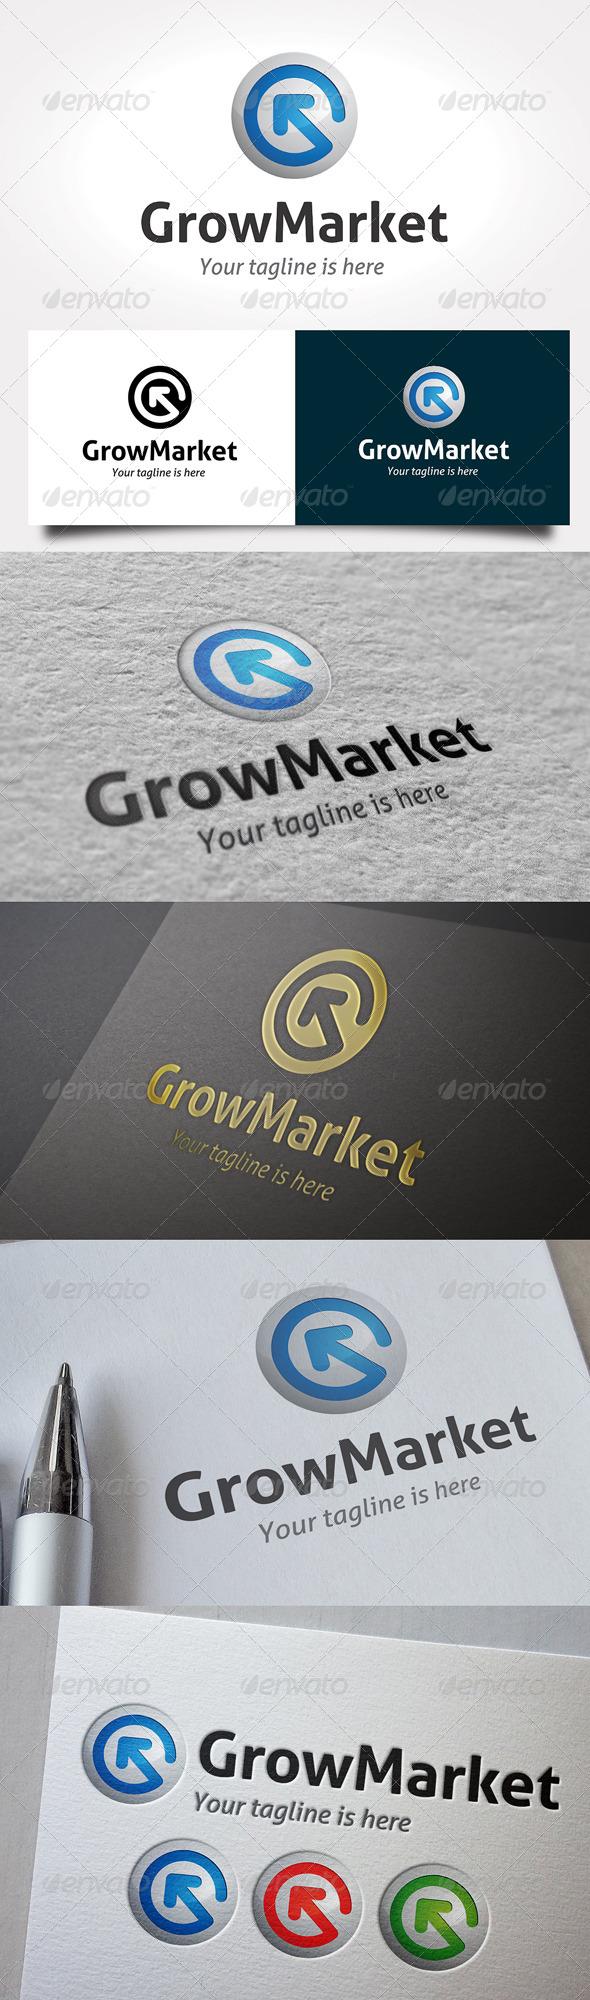 Grow Market Logo